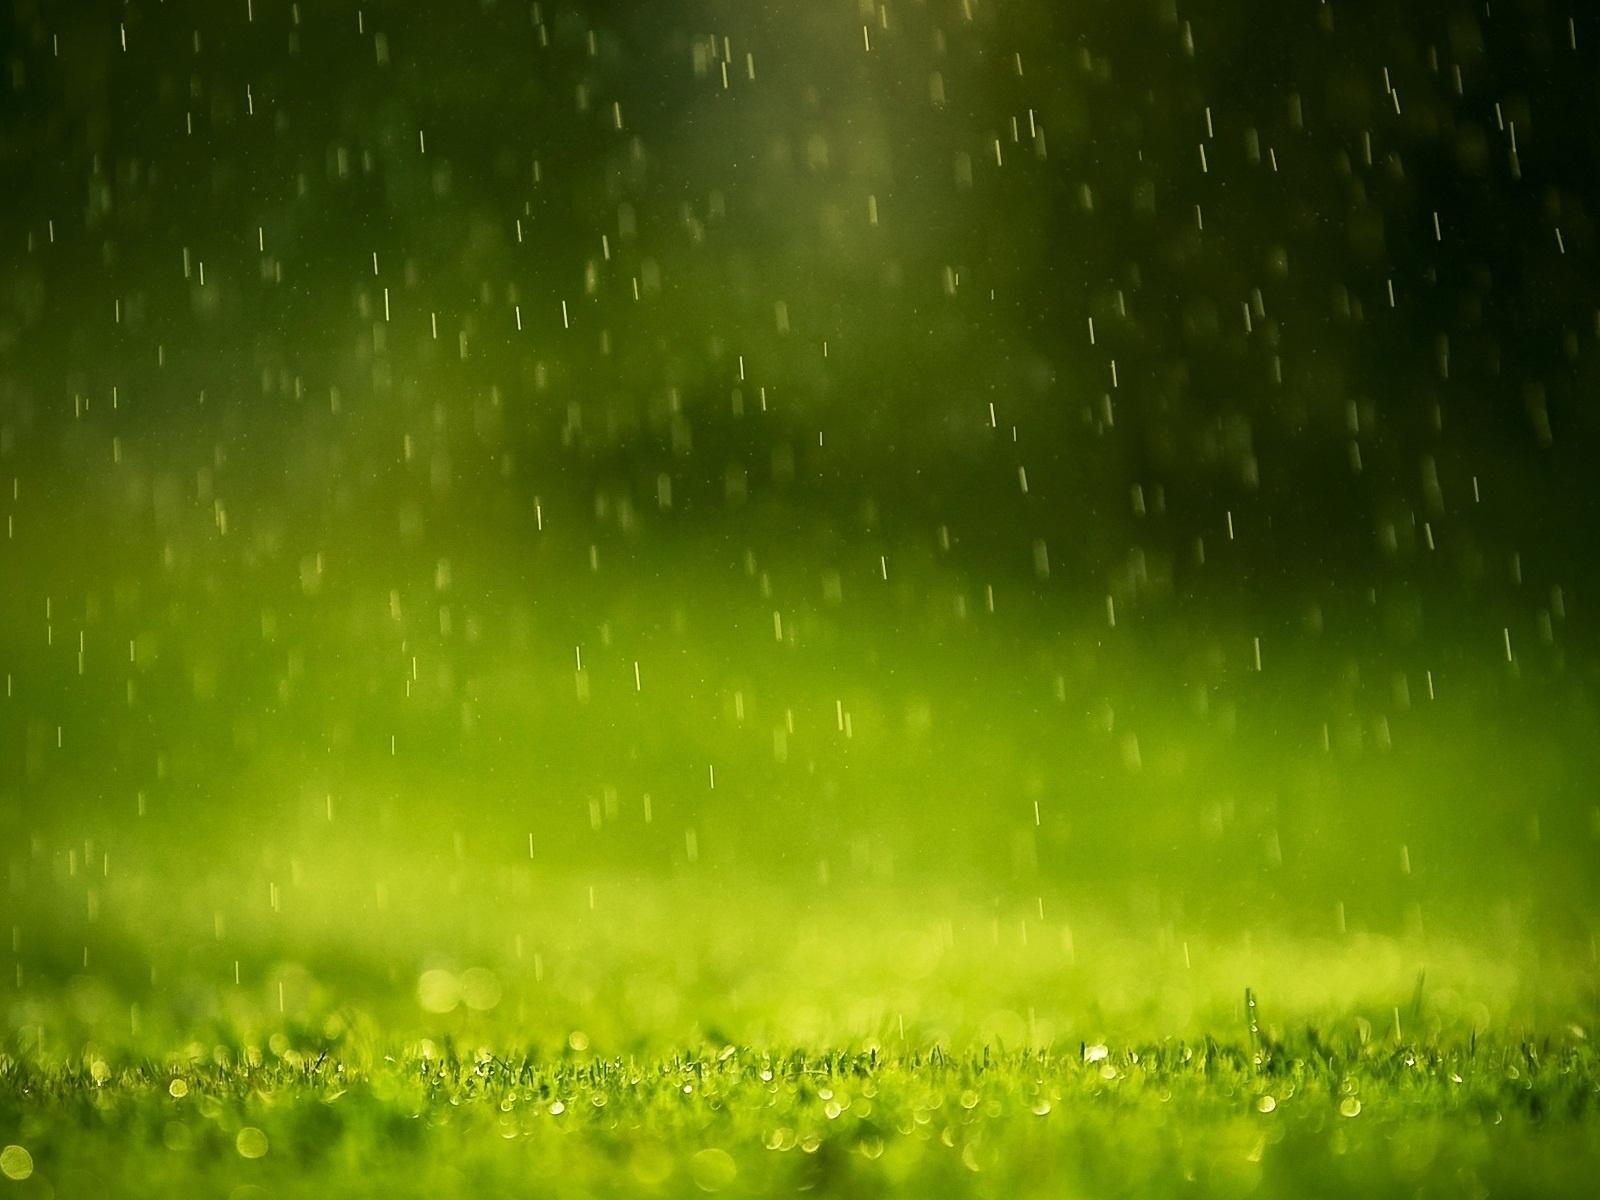 Raining On Grass Green Lights Macro Photography Hd Wallpaper